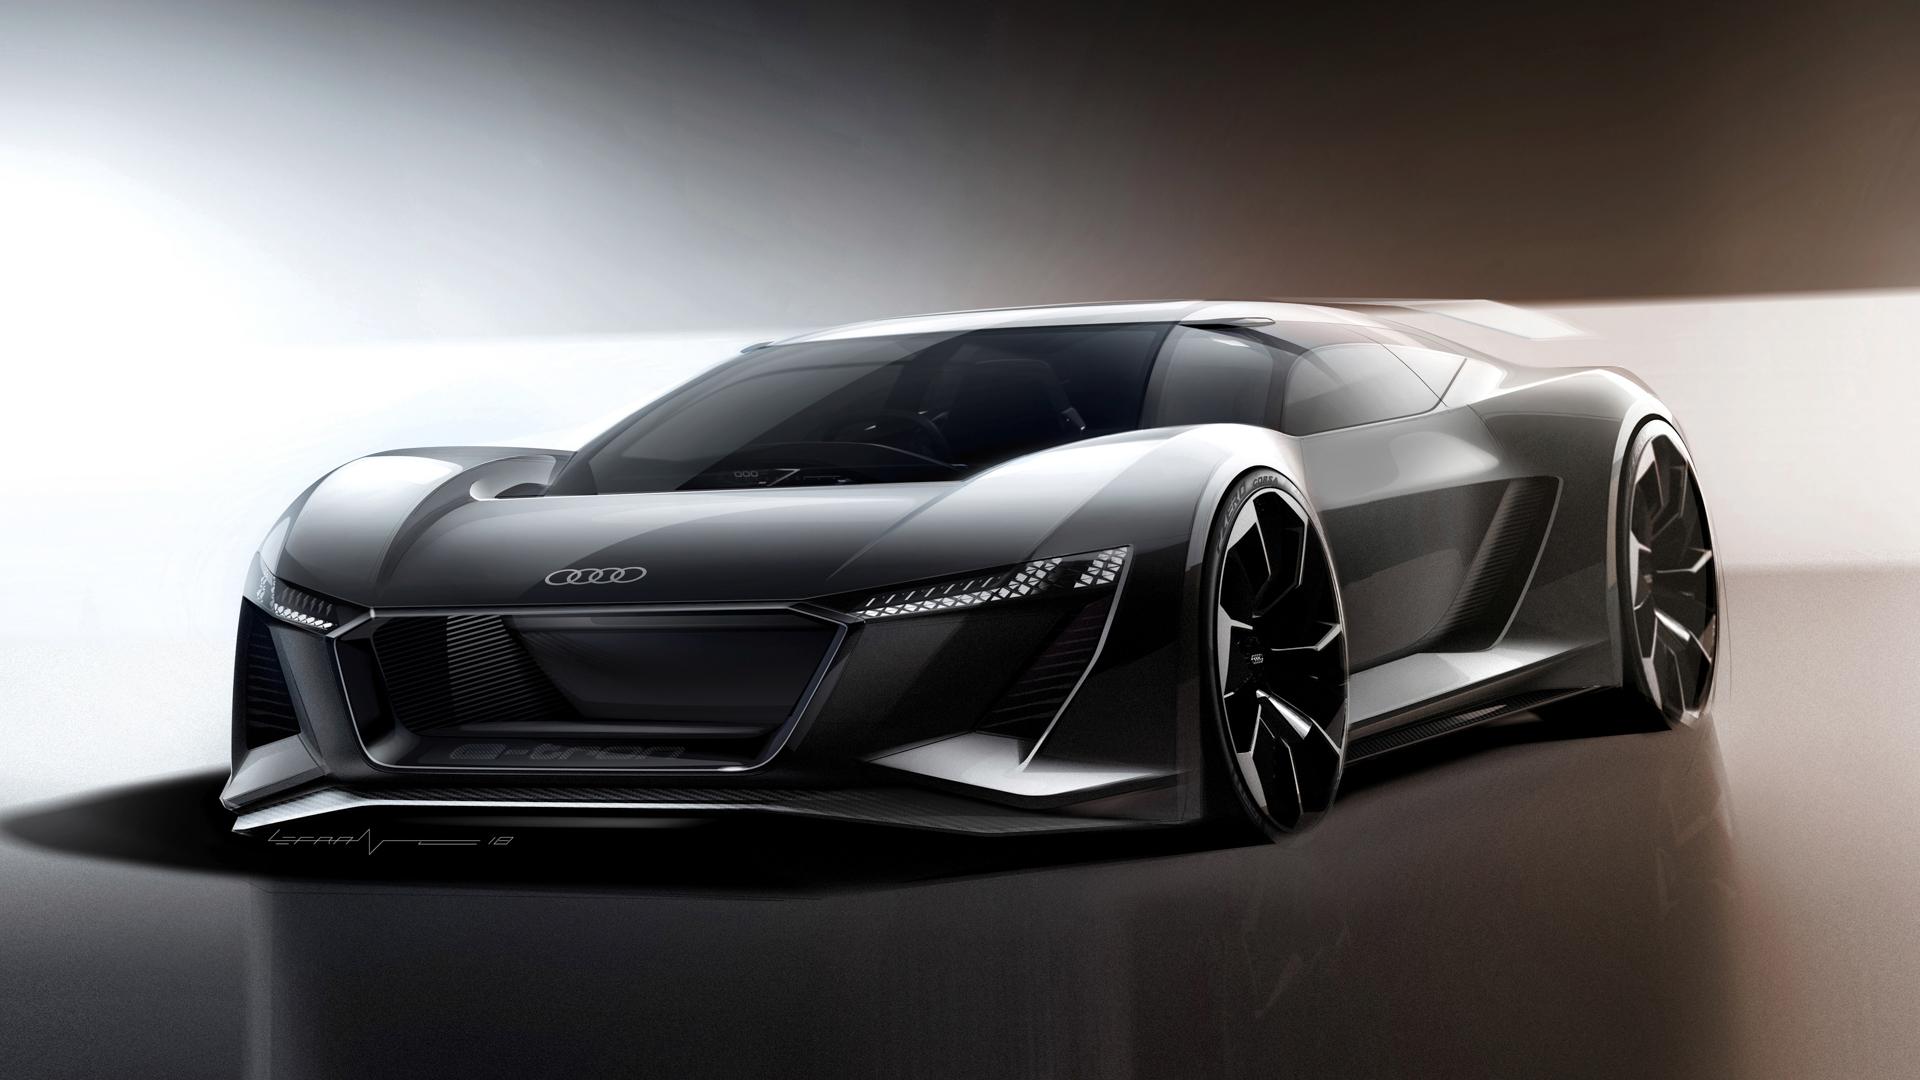 Audi Supercar Price